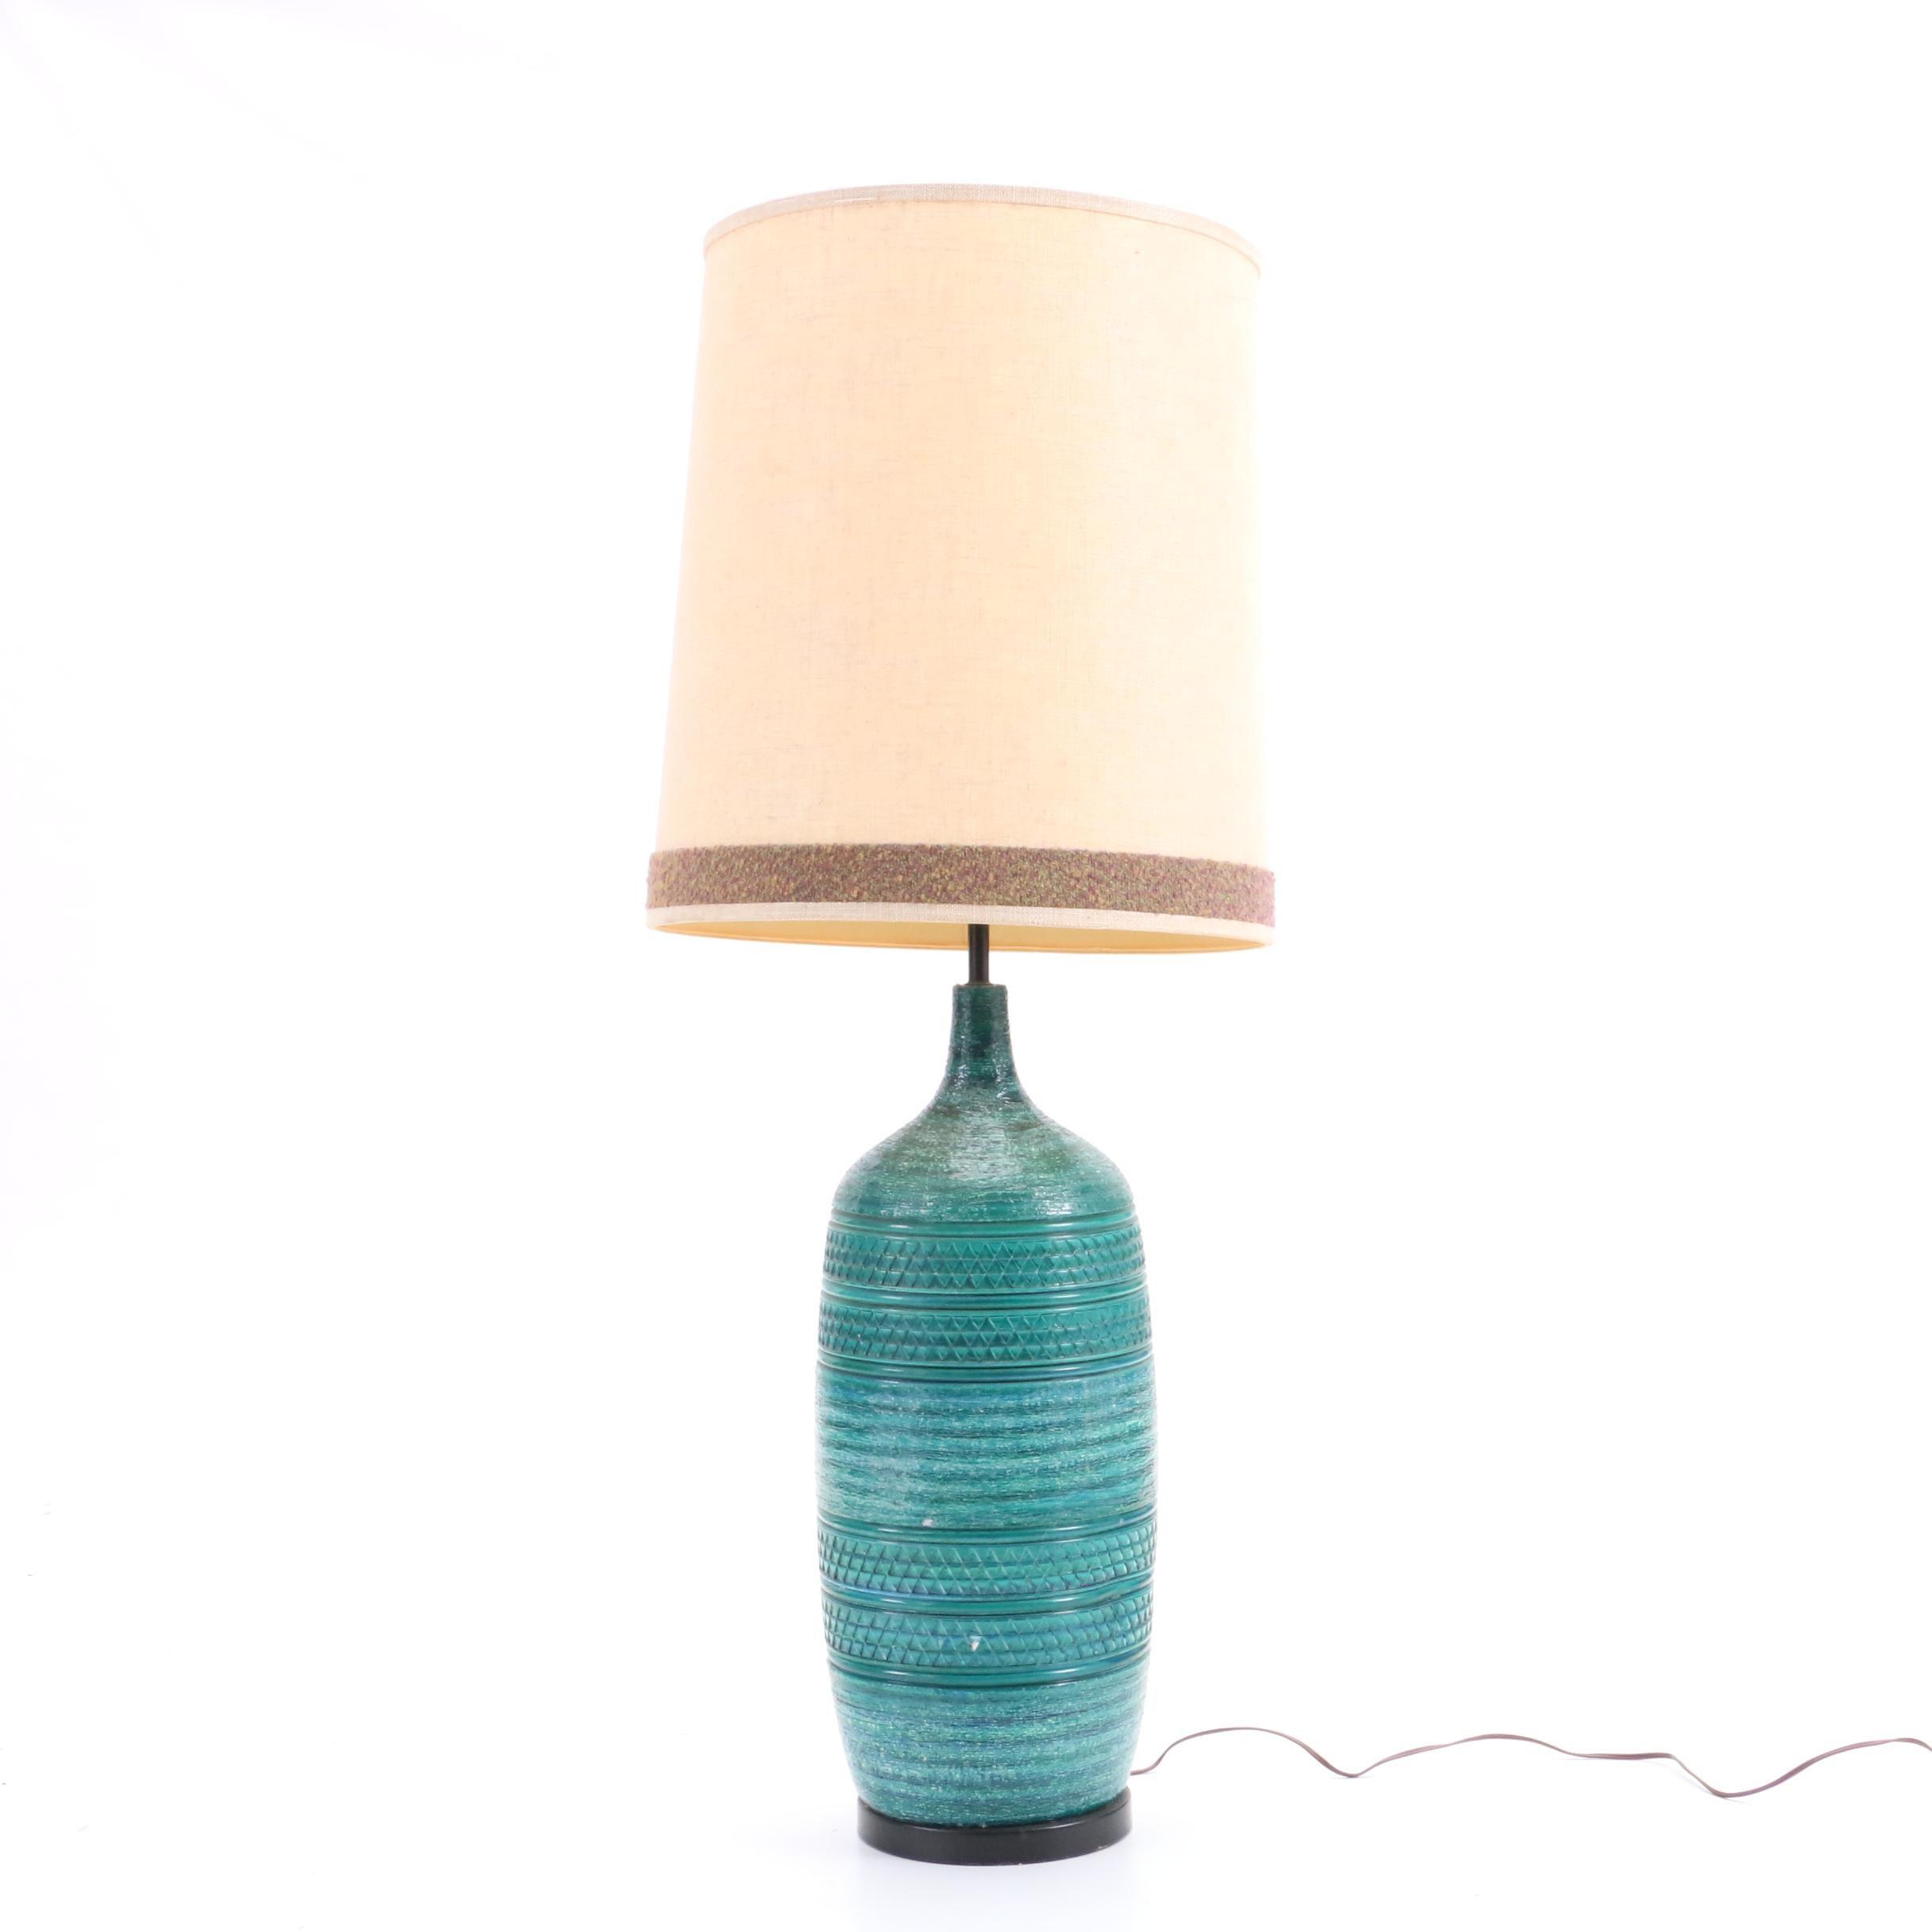 Mid Century Teal Ceramic Table Lamp After Bitossi Ebth